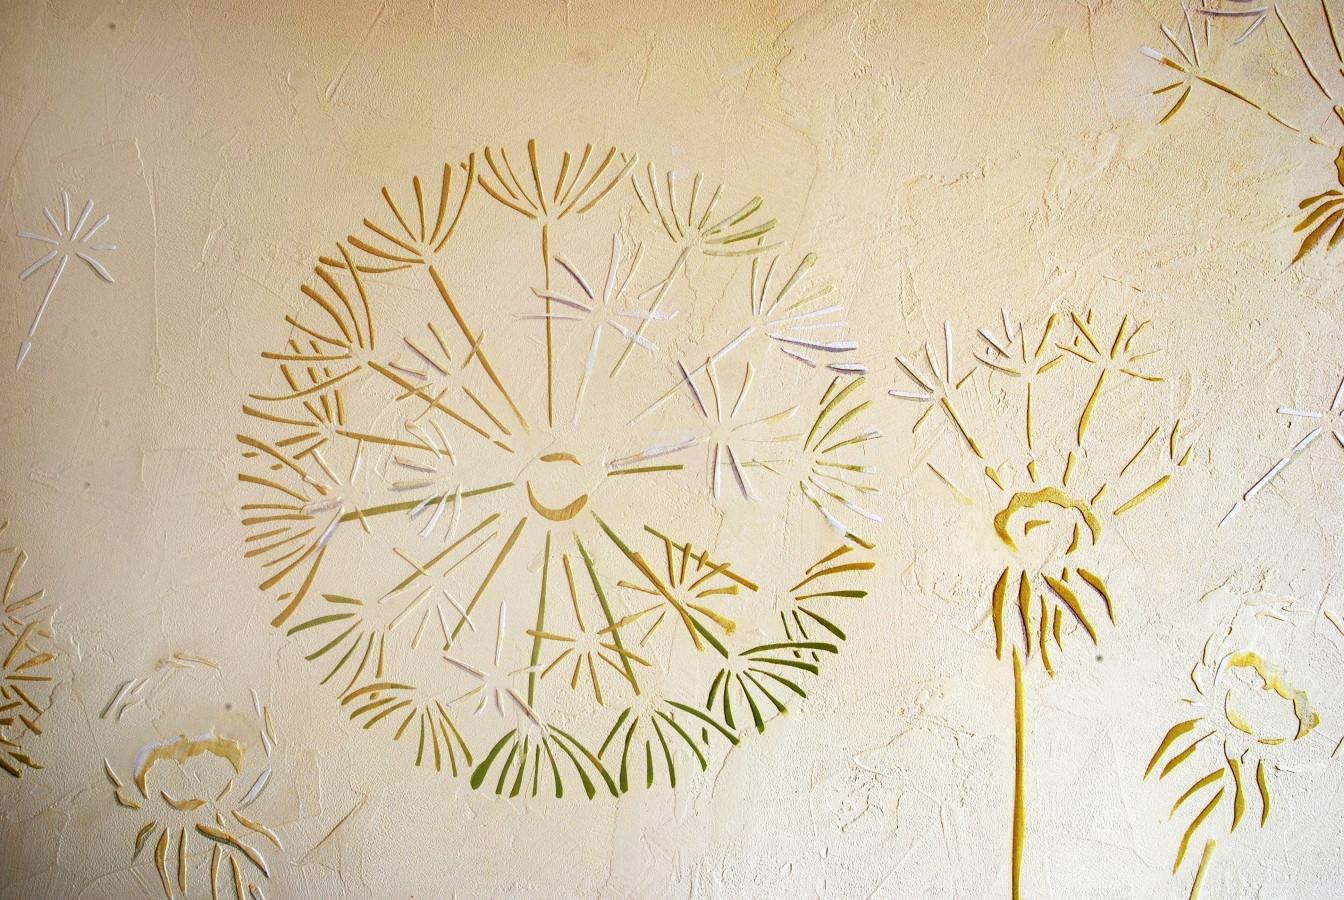 Sienos dekoras. Pienių motyvas. Reljefinis dekoras. Dekoruota siena. Interjero dizainas. Decorated wall. Wall Decor.  Embossed wall decor. Interior design. Dandelion.